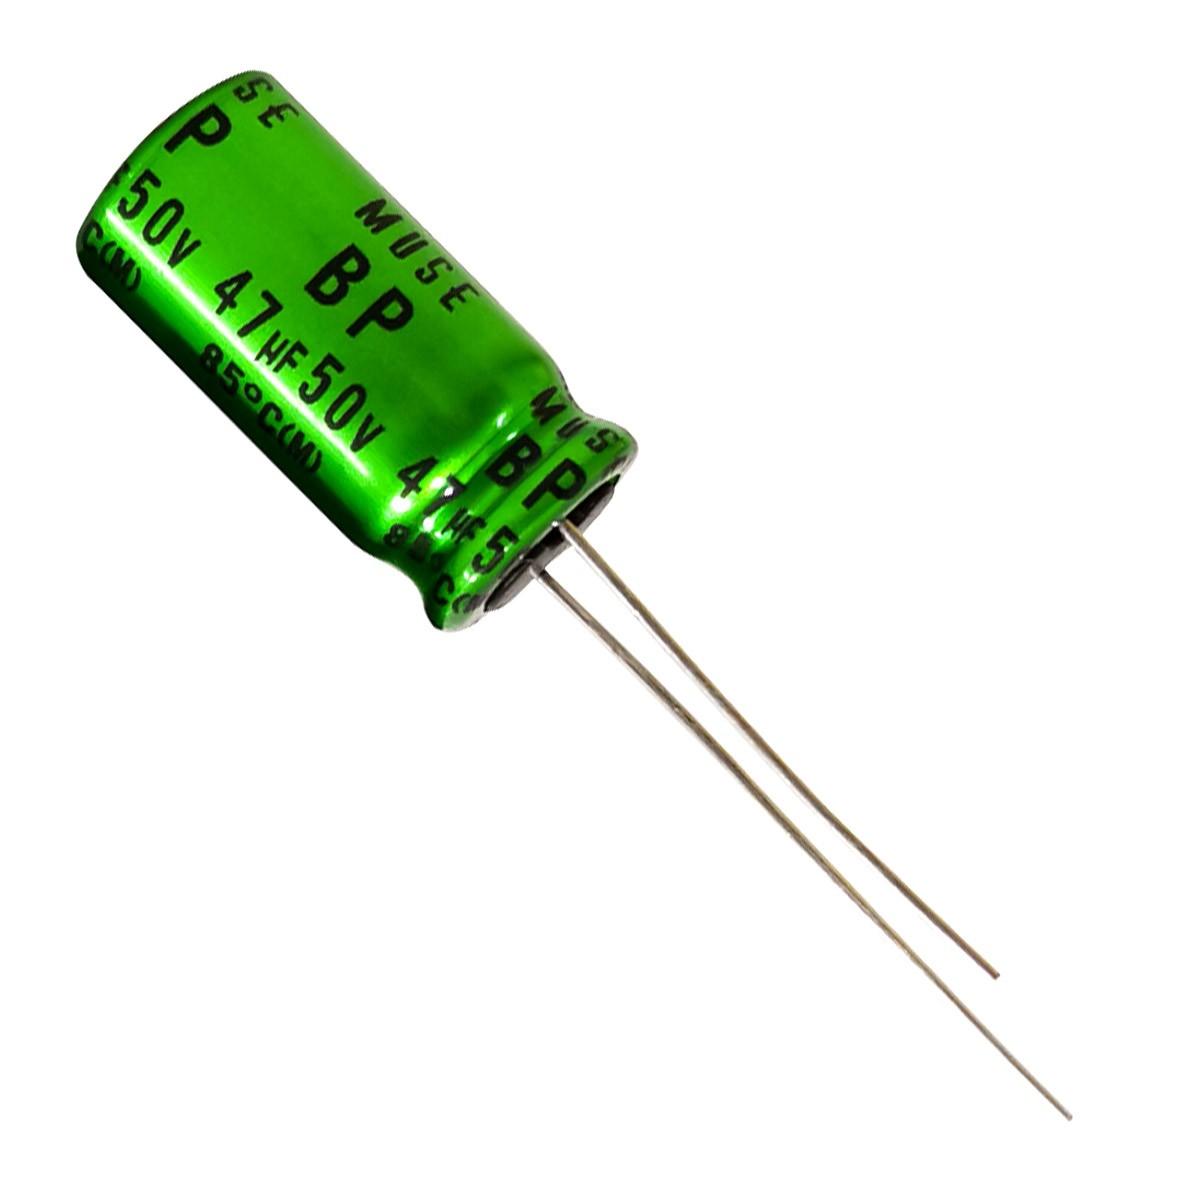 NICHICON ES MUSE Condensateur Audio Audiophile 35V 10µF